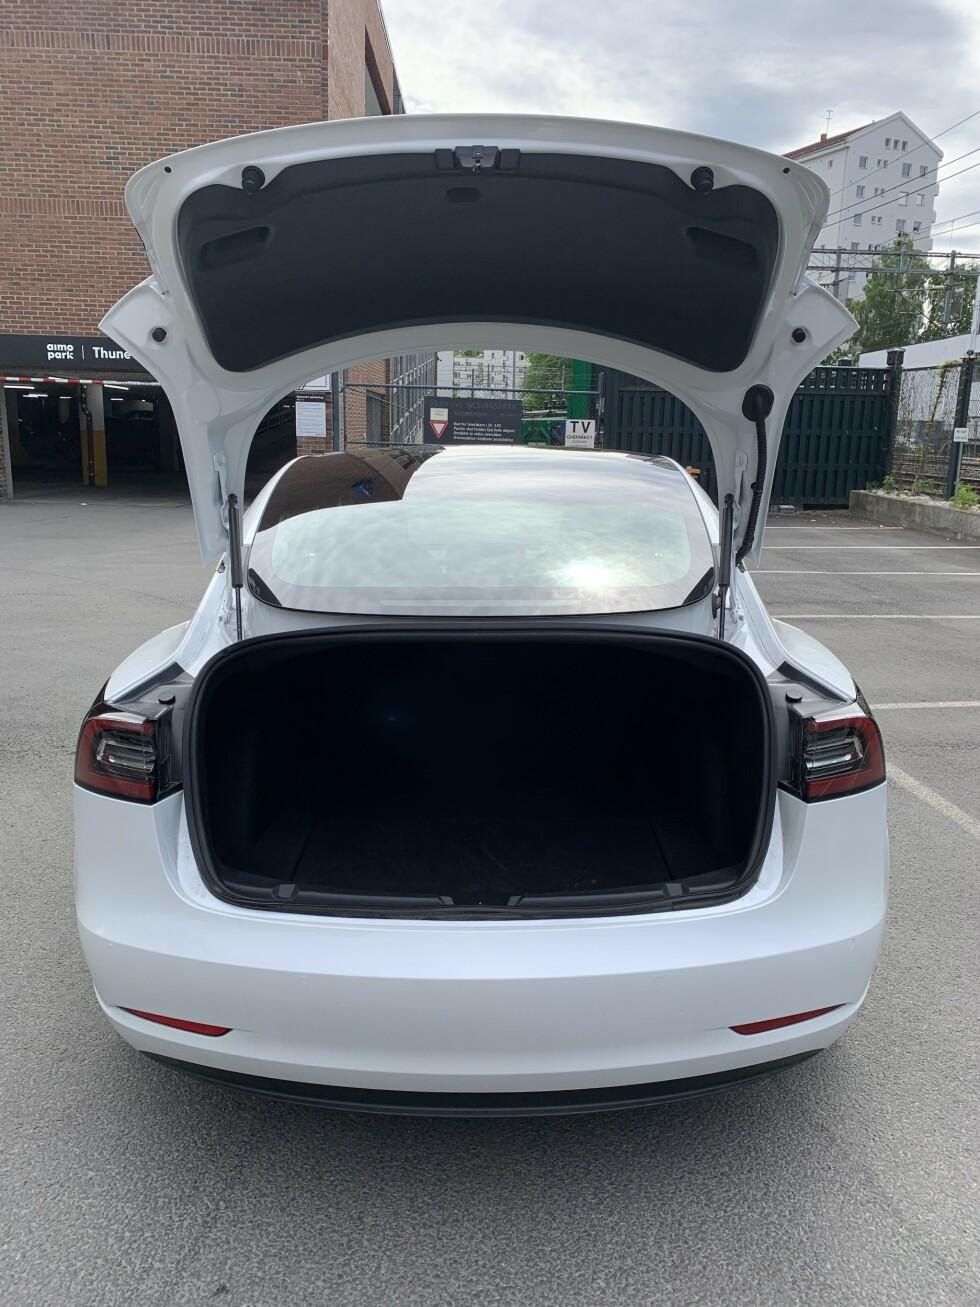 <strong>DYPT, MEN LAVT:</strong> Bagasjerommet på Tesla Model 3. Foto: Øystein B. Fossum